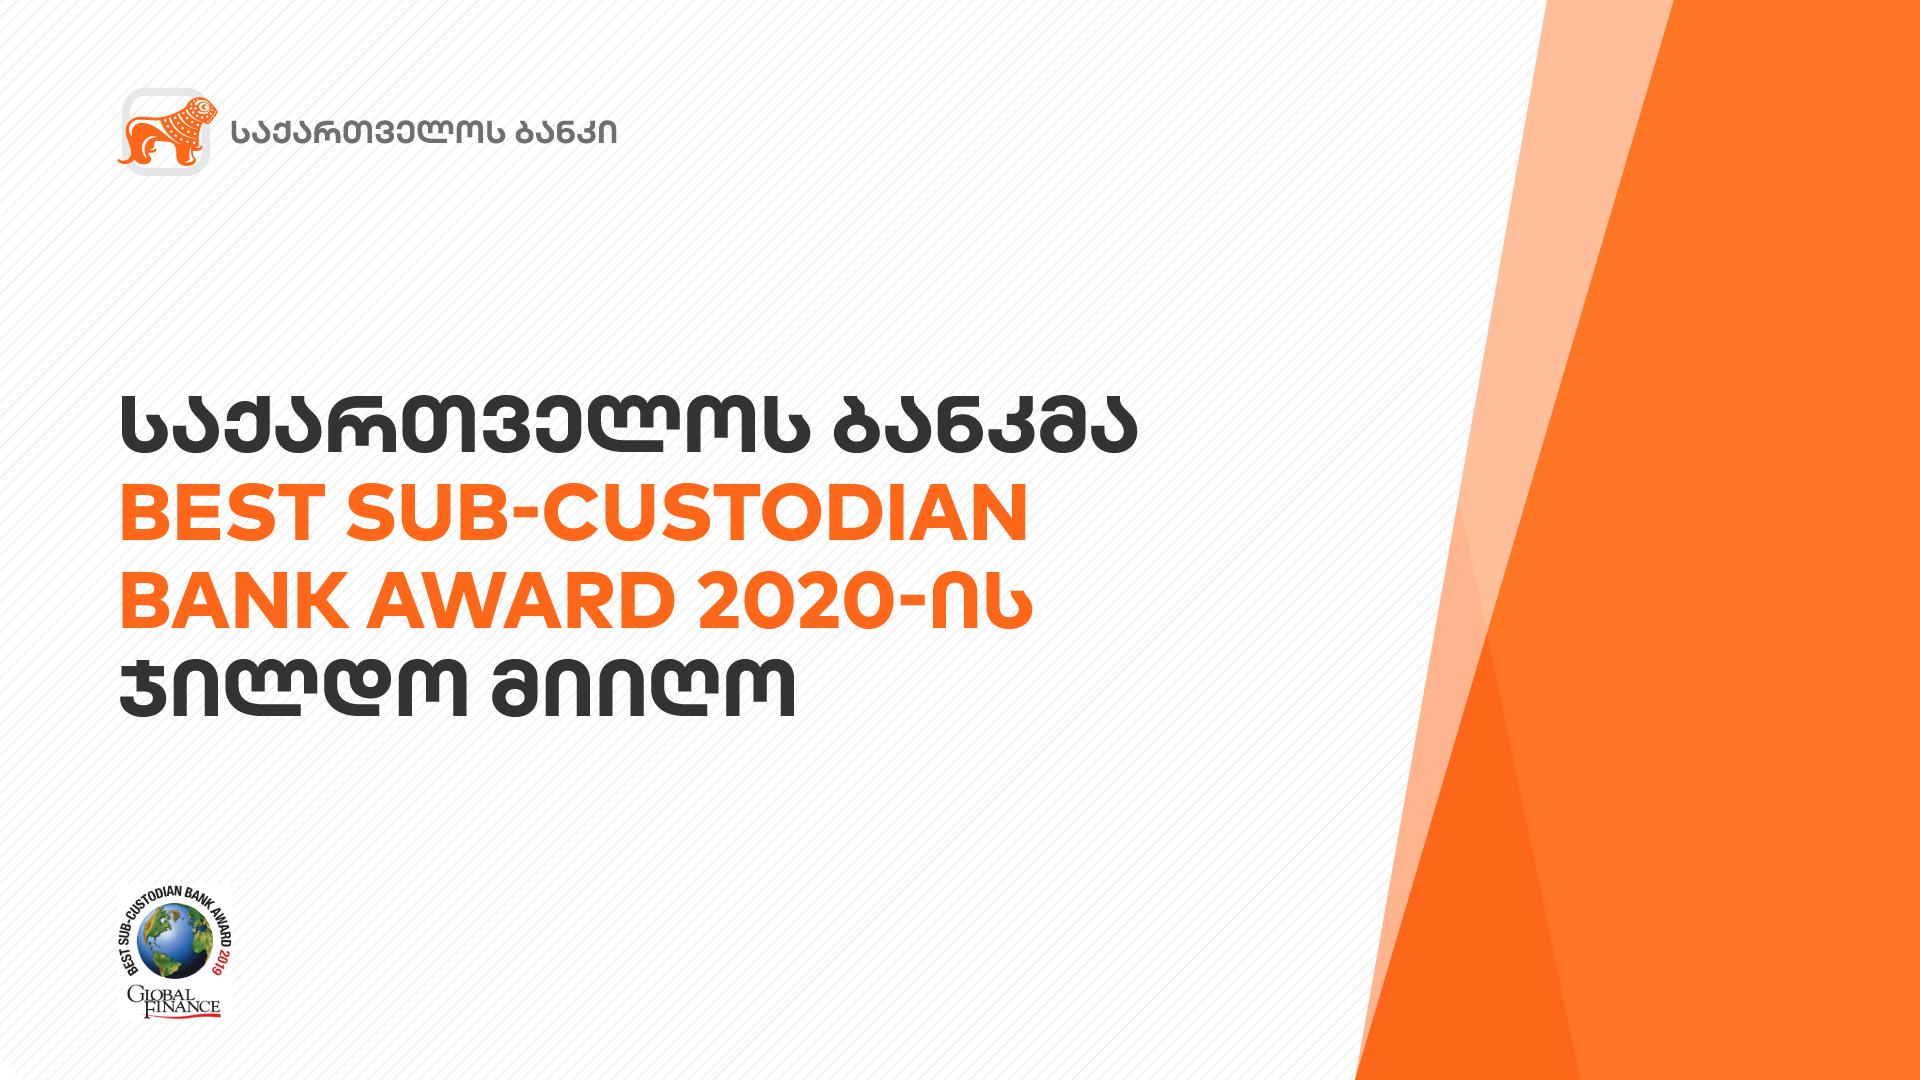 Photo of საქართველოს ბანკმა Global Finance- ის Best Sub-Custodian Bank Award 2020 –ის ჯილდო მიიღო